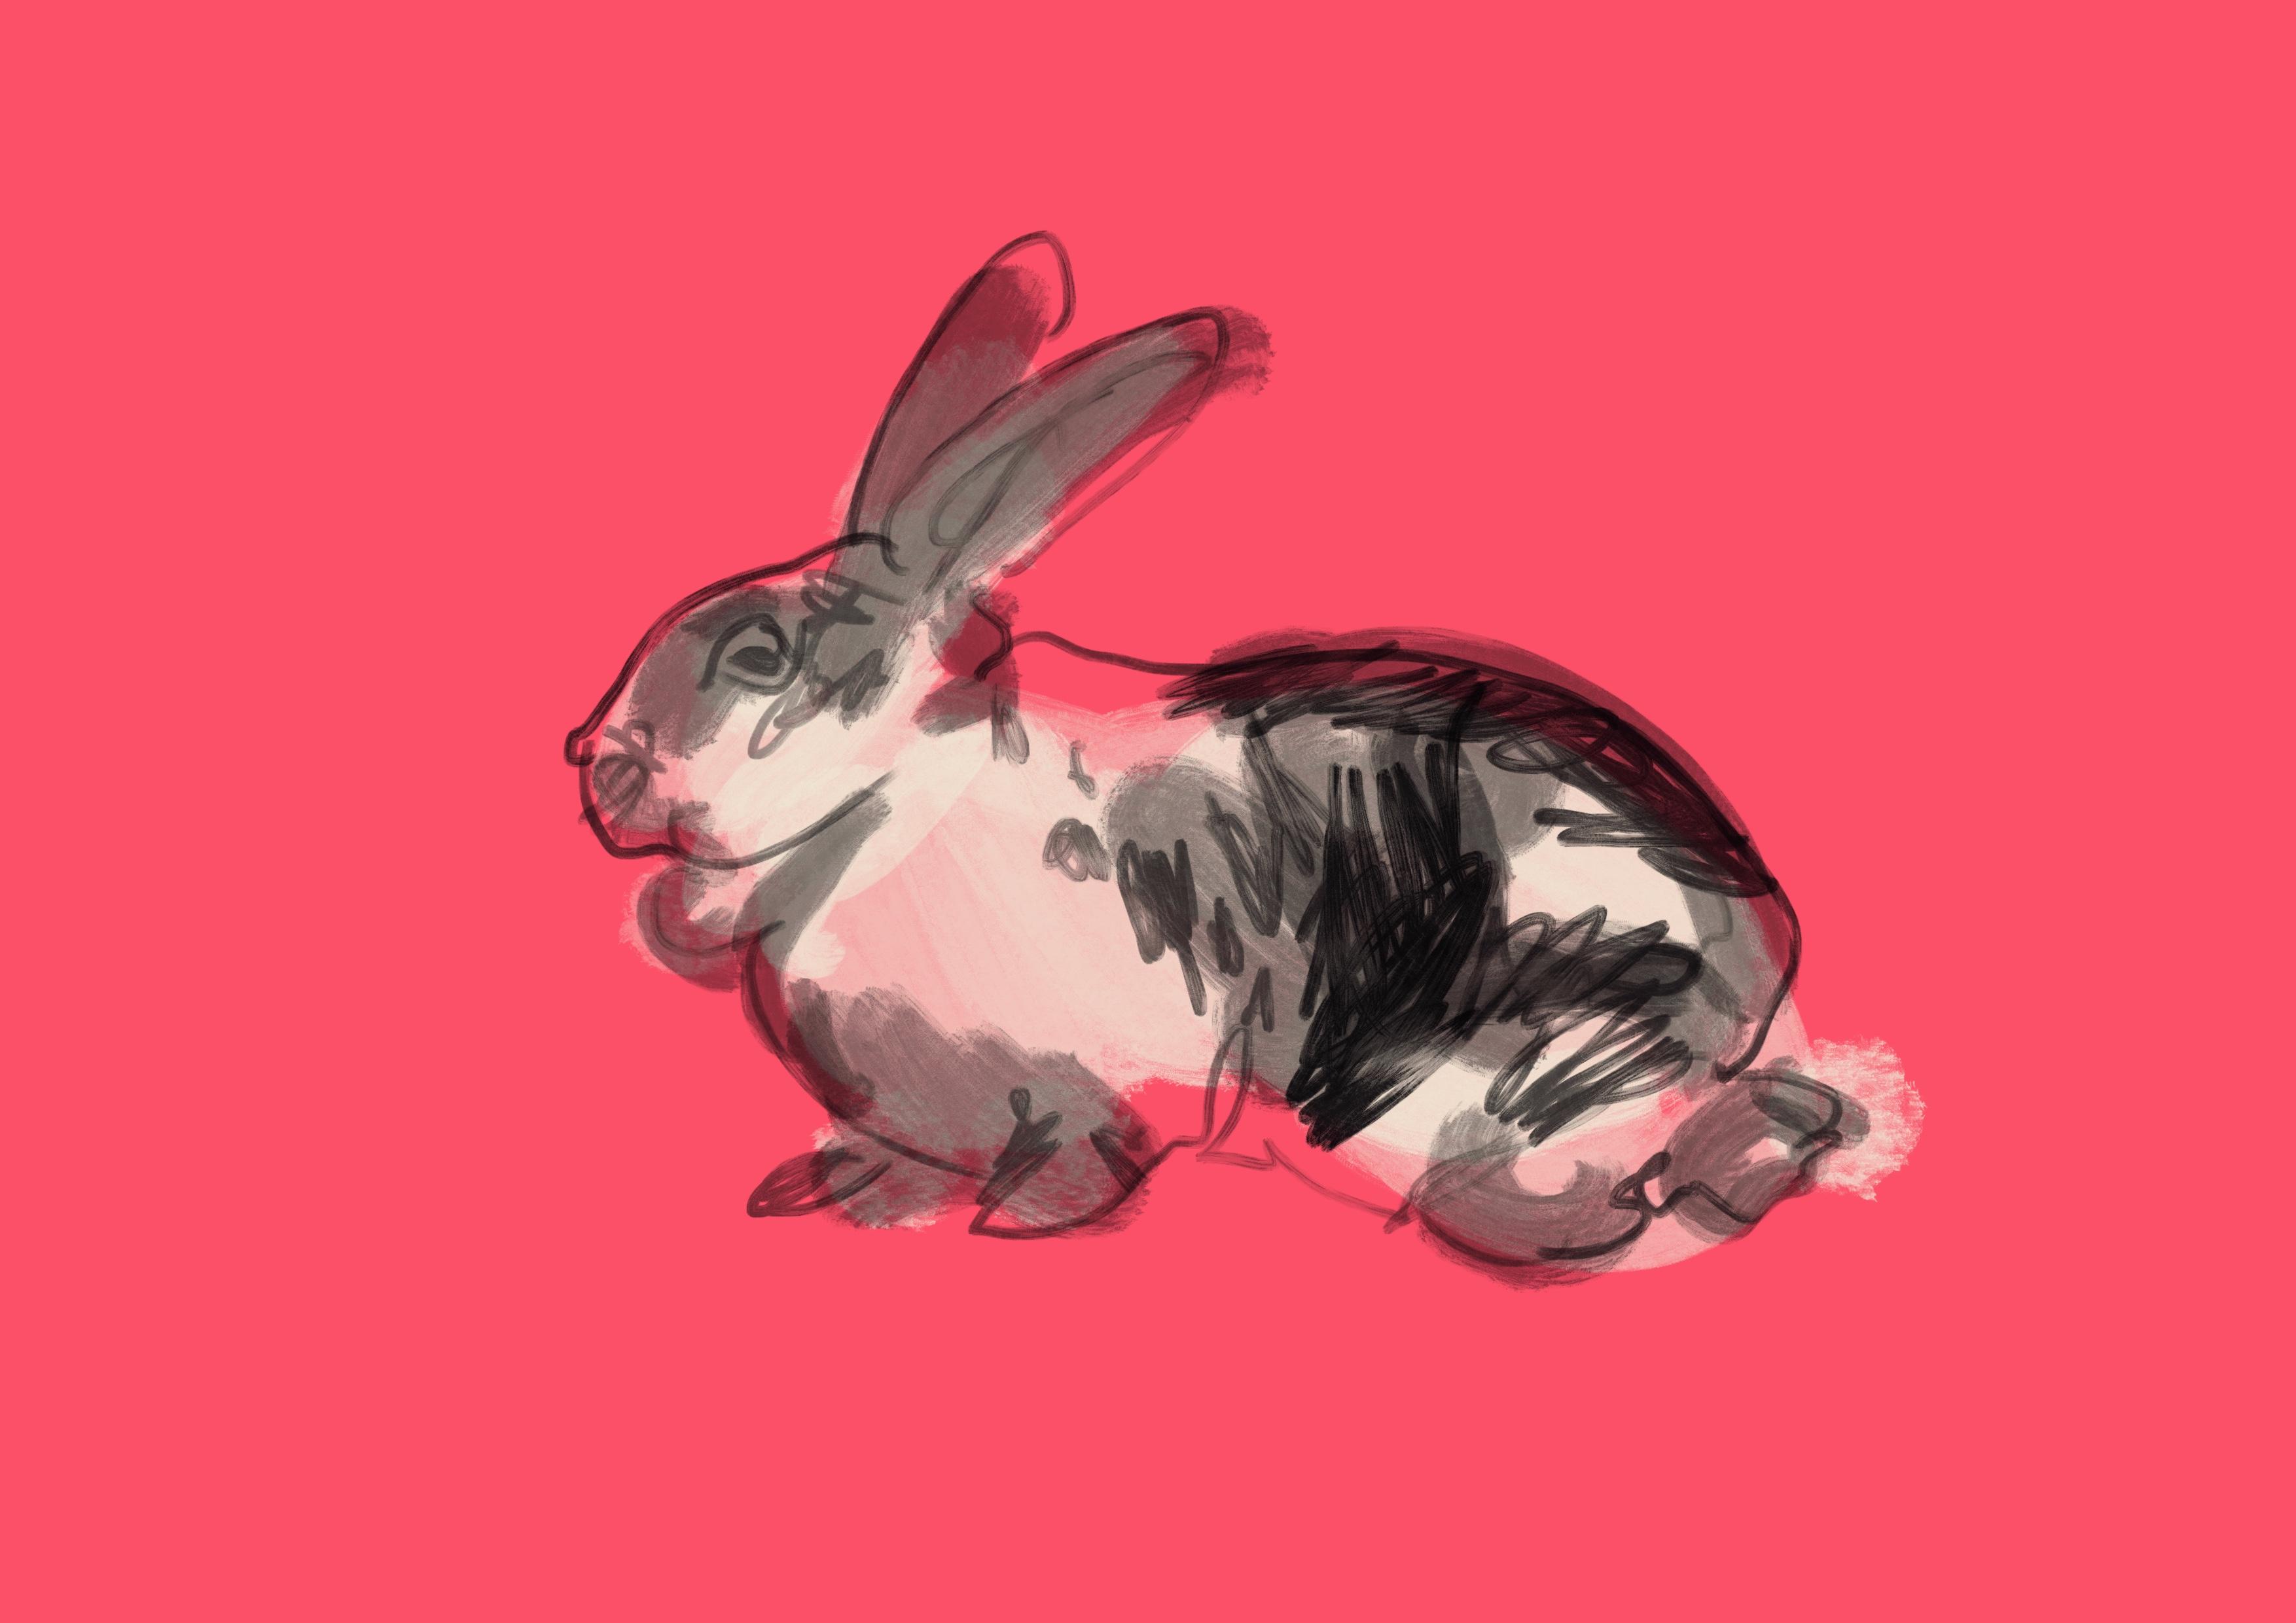 RabbitFazi